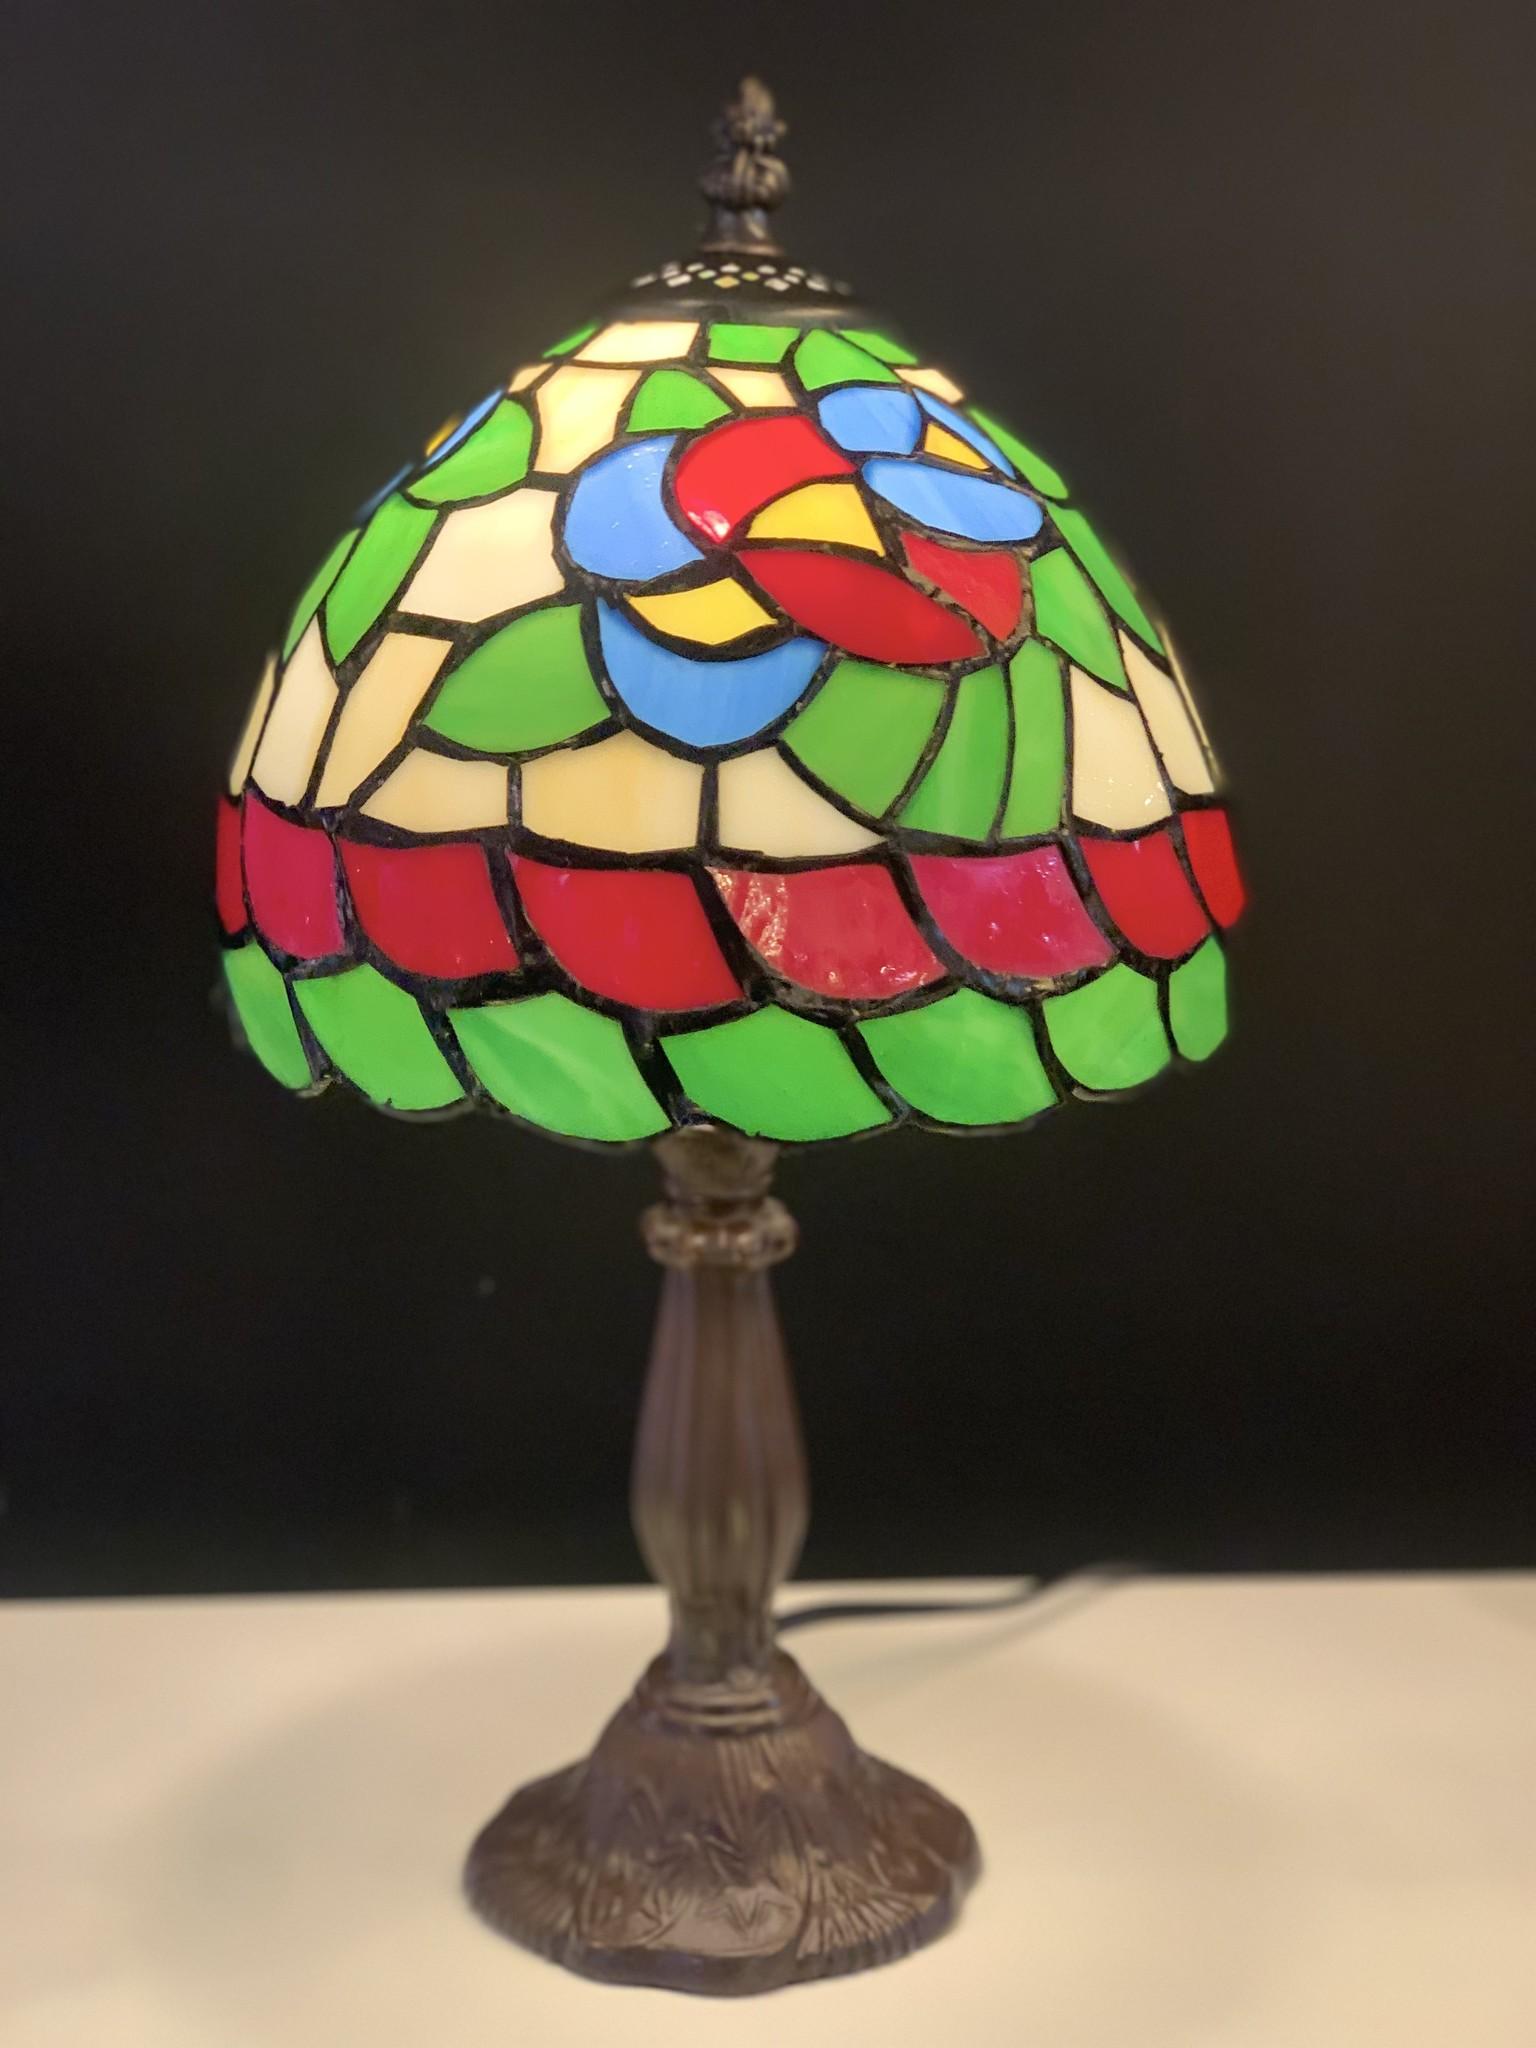 RoMaLux D10094 Tiffany tafellampje